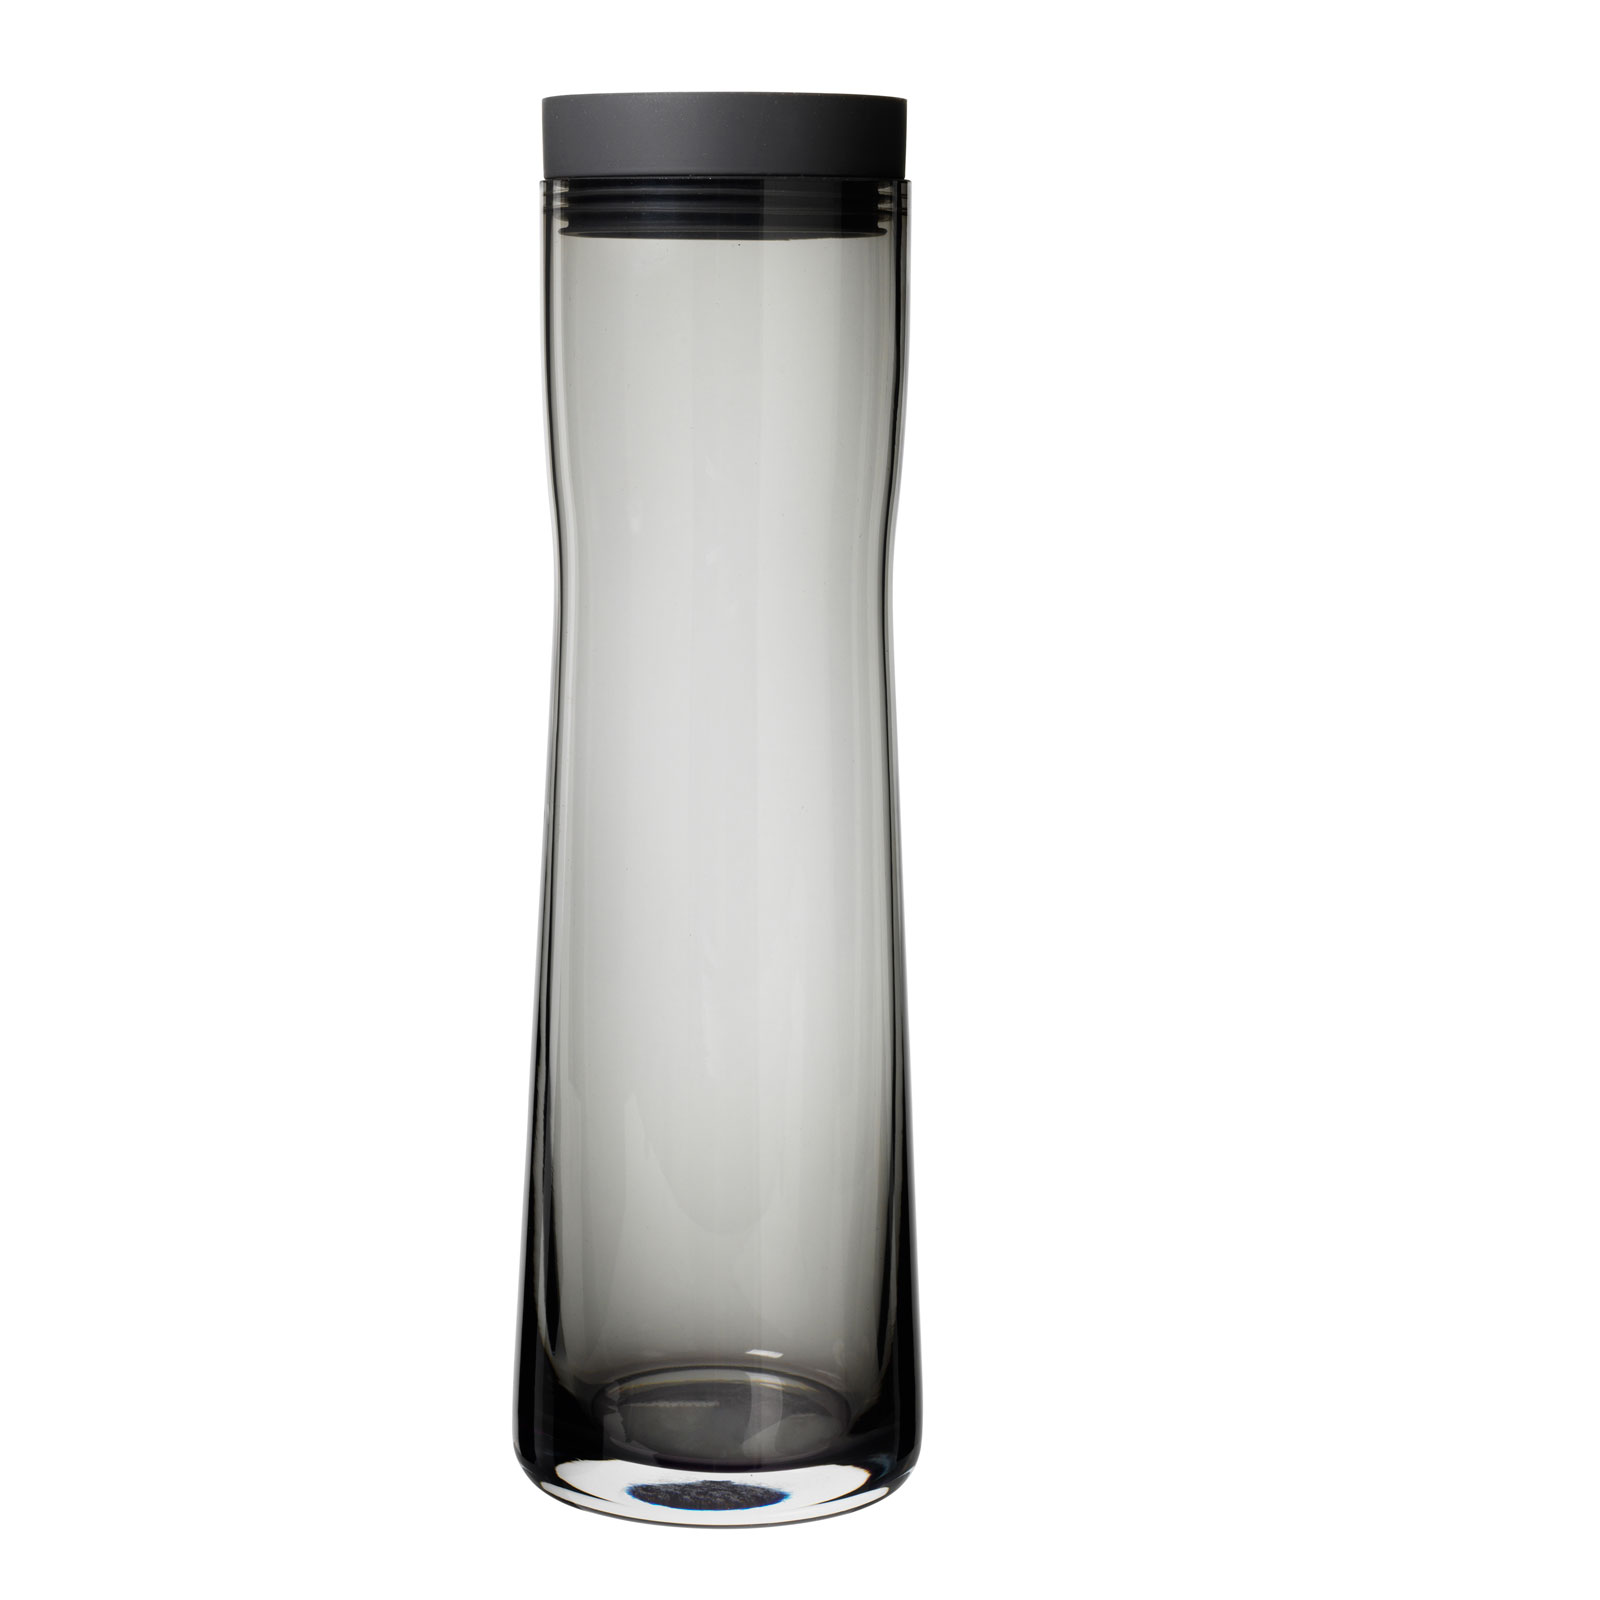 blomus Glas Wasserkaraffe grau SPLASH Vol. 1 Liter